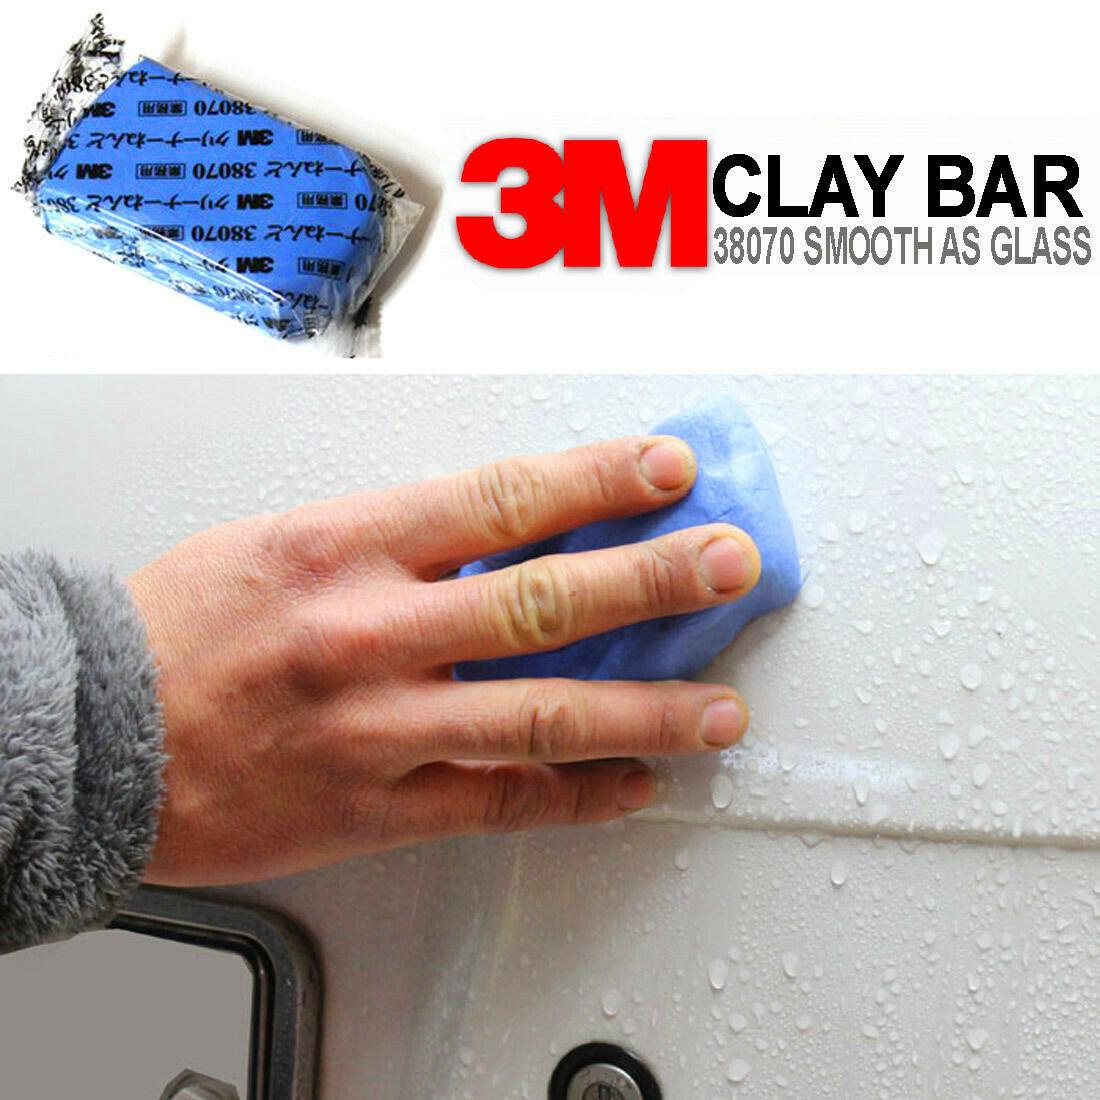 Magic Clean Clay Bar Car Truck Blue Cleaning Clay Bar Auto Detailing Clean Clay Care Tools Sludge Washing Mud Car Washer 3m 2021